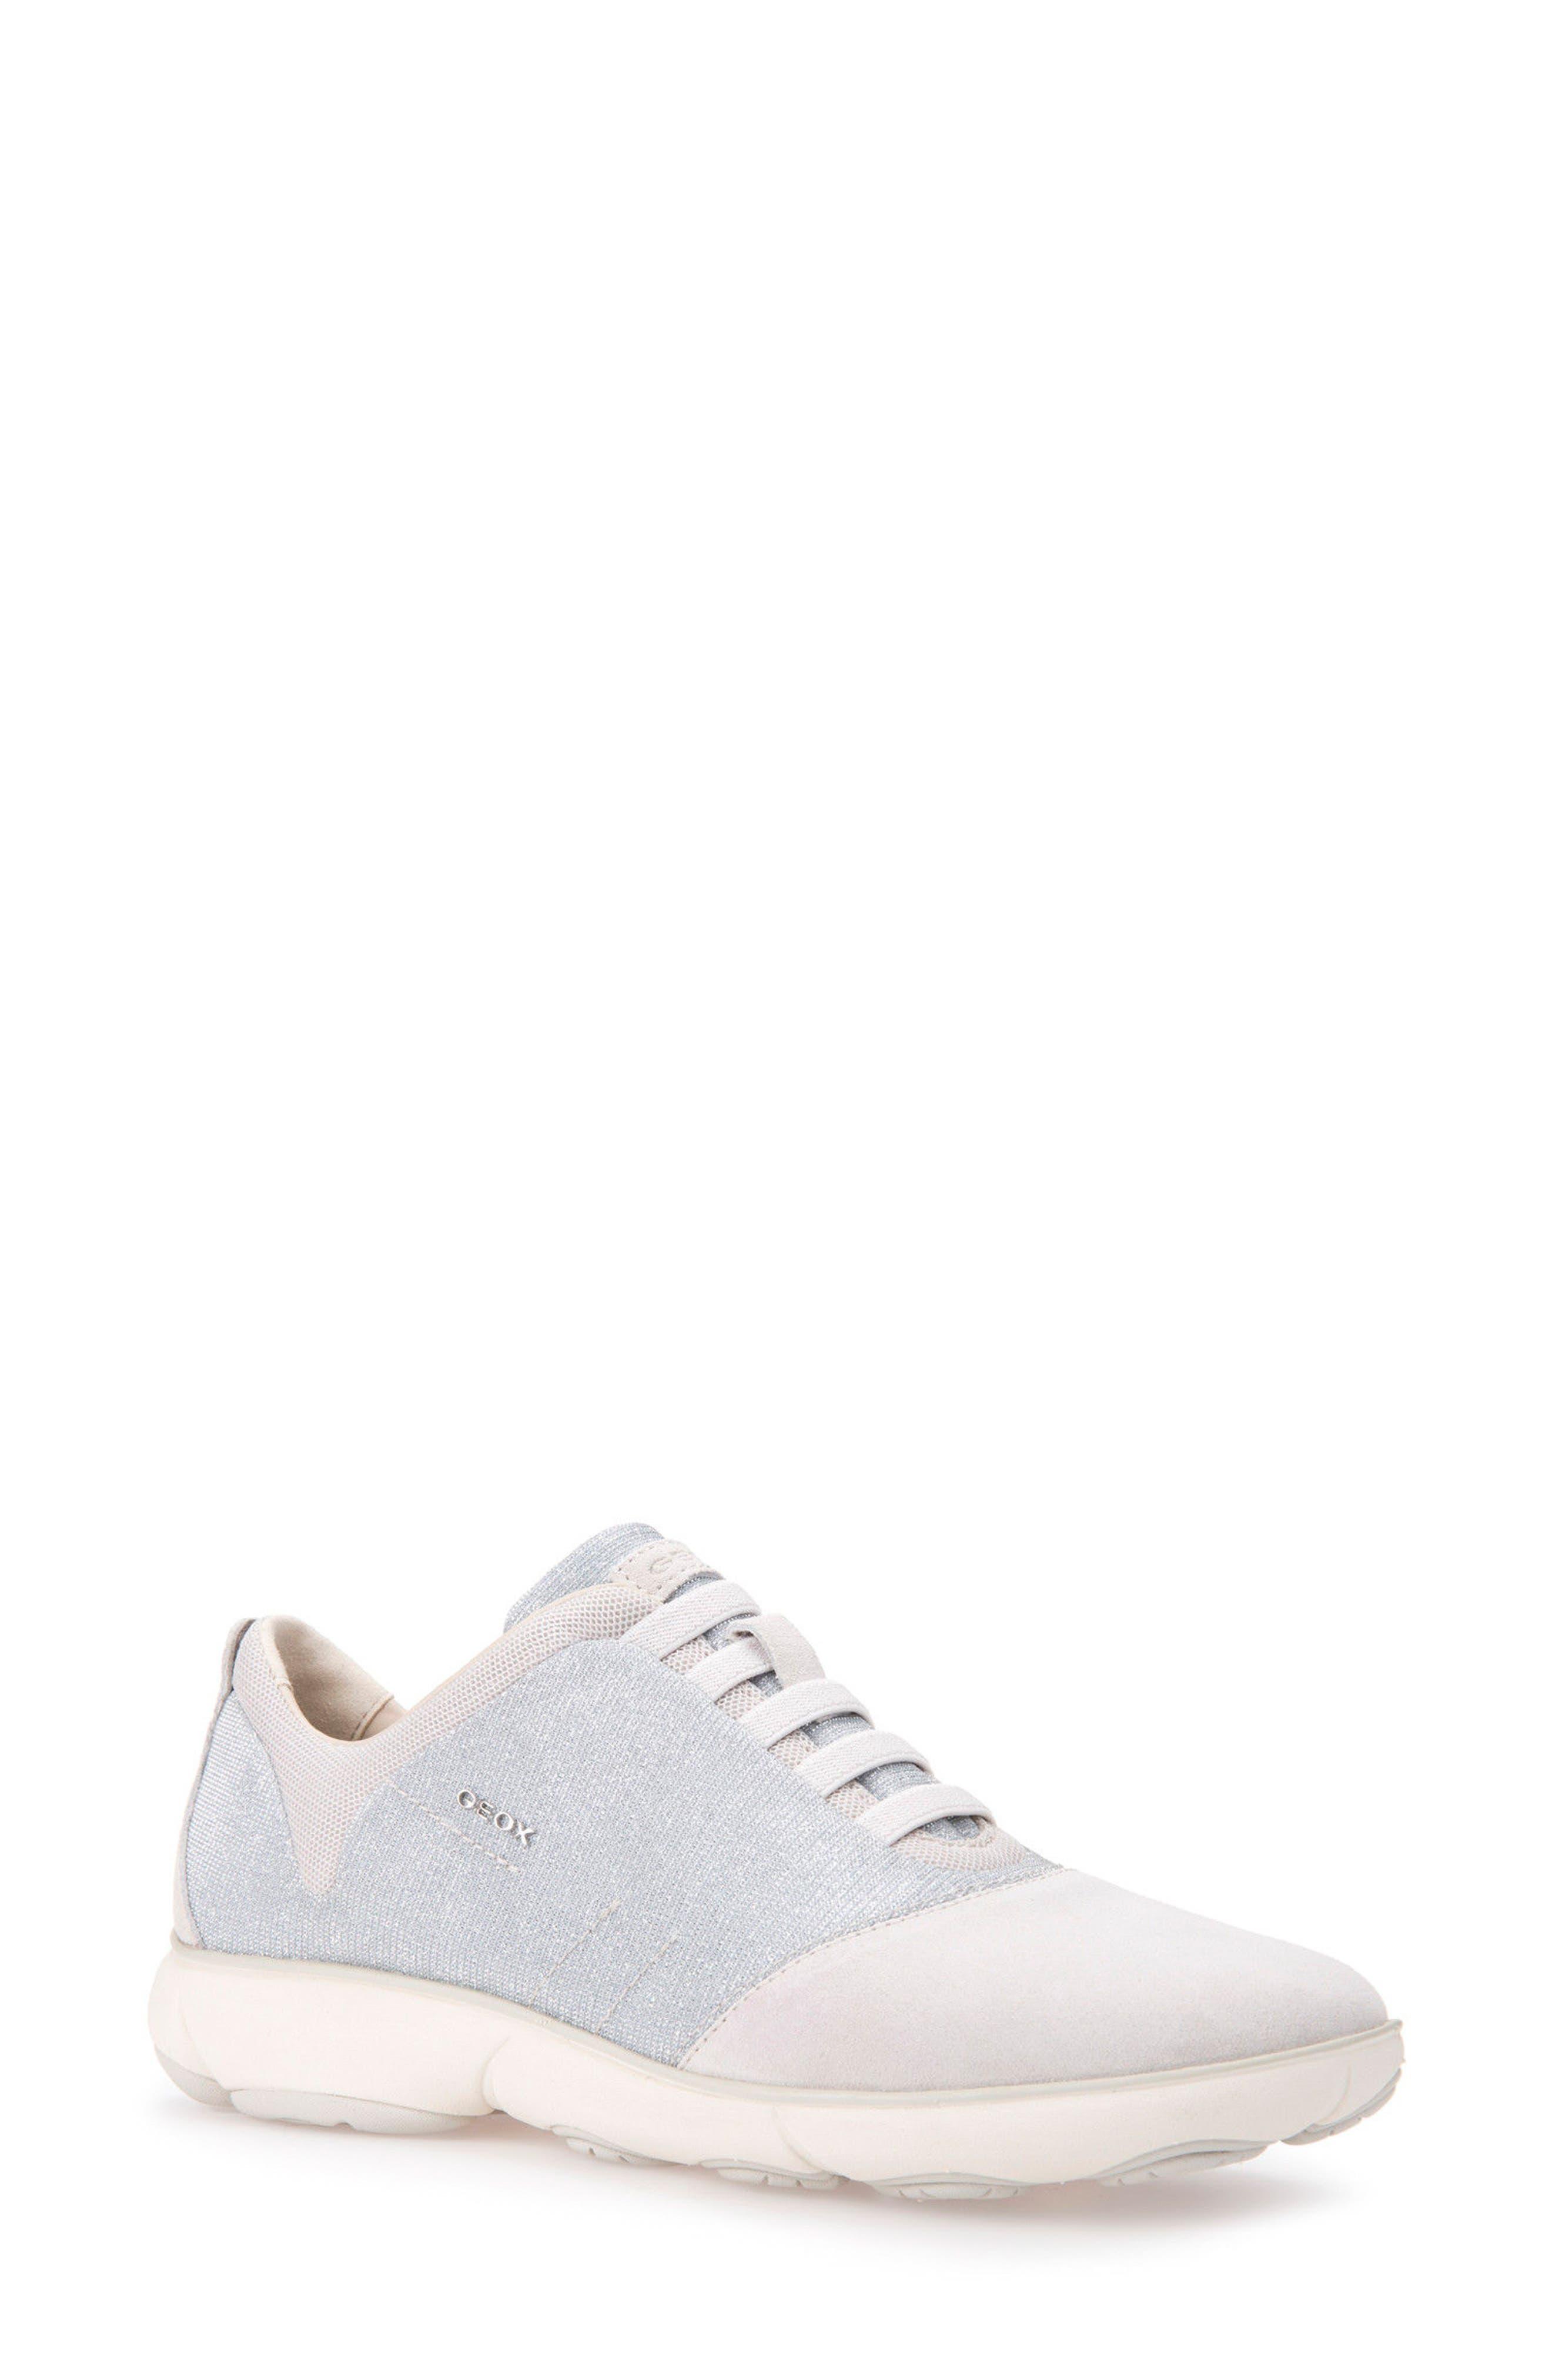 Nebula Slip-On Sneaker,                             Main thumbnail 7, color,